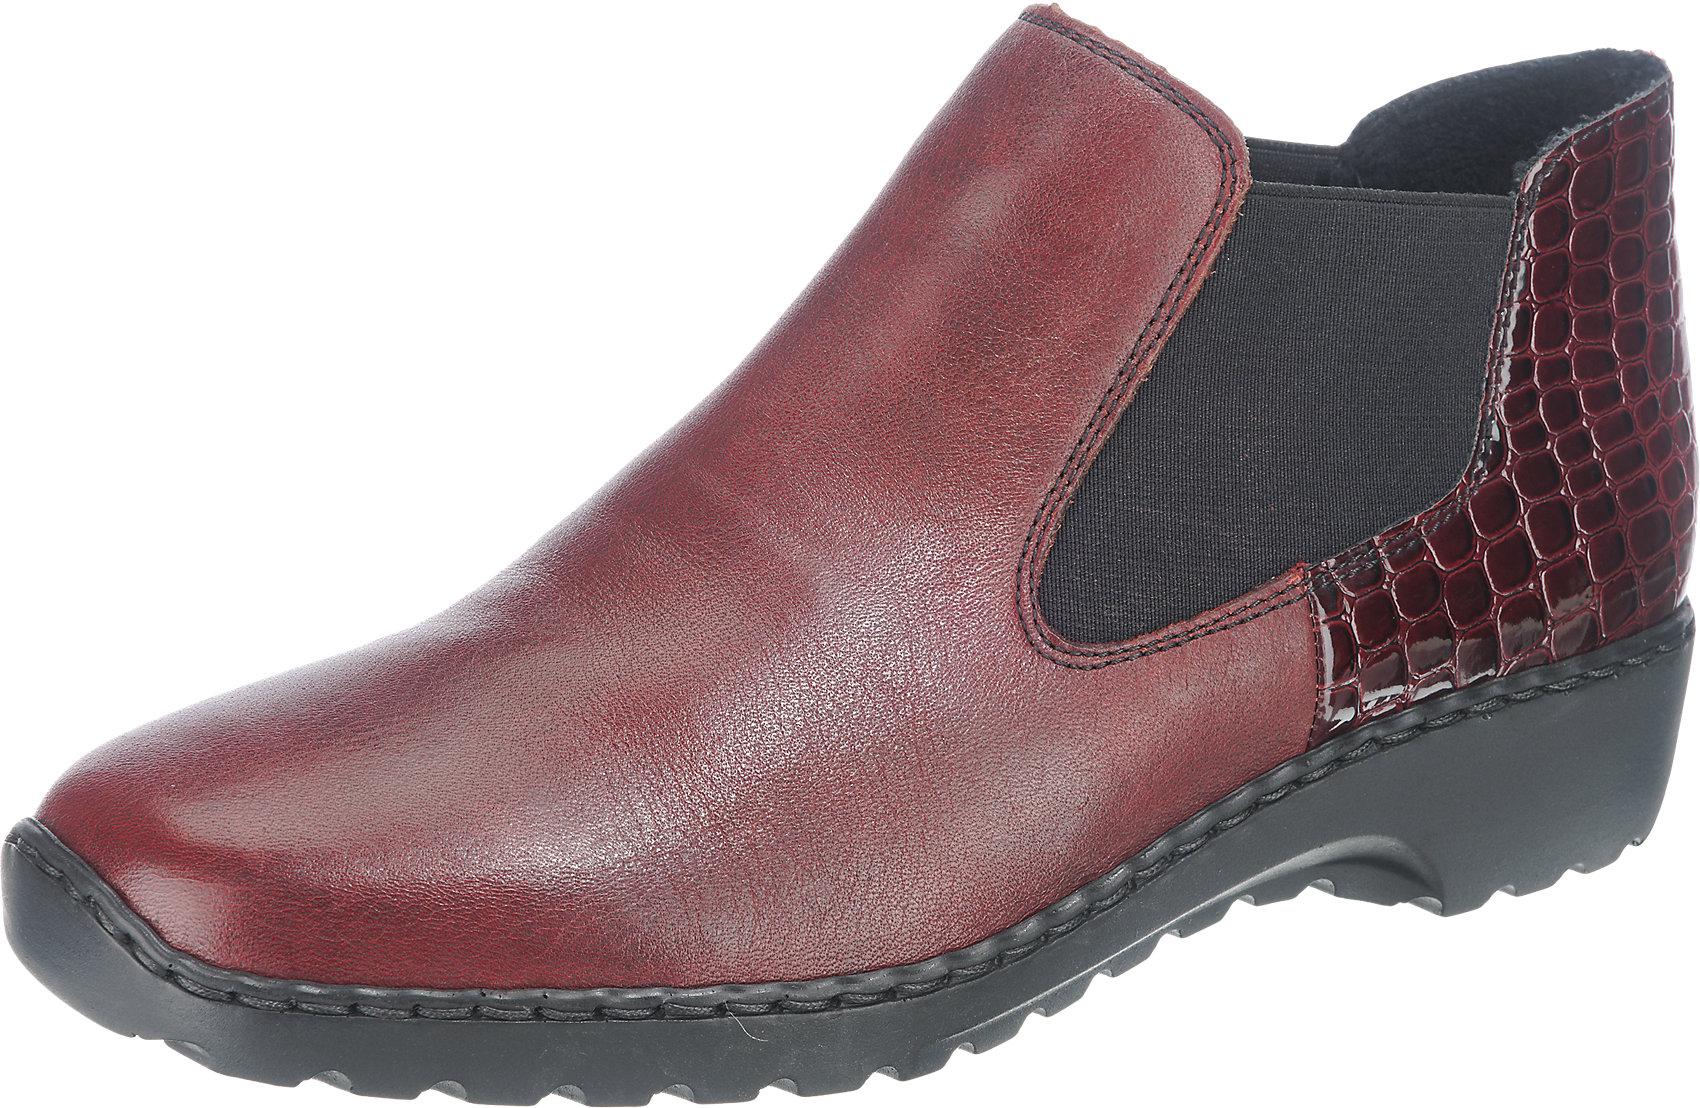 Rieker L5223 05 Stiefel Stiefeletten Boots Damenschuhe rot 36 42 Neu25 | eBay